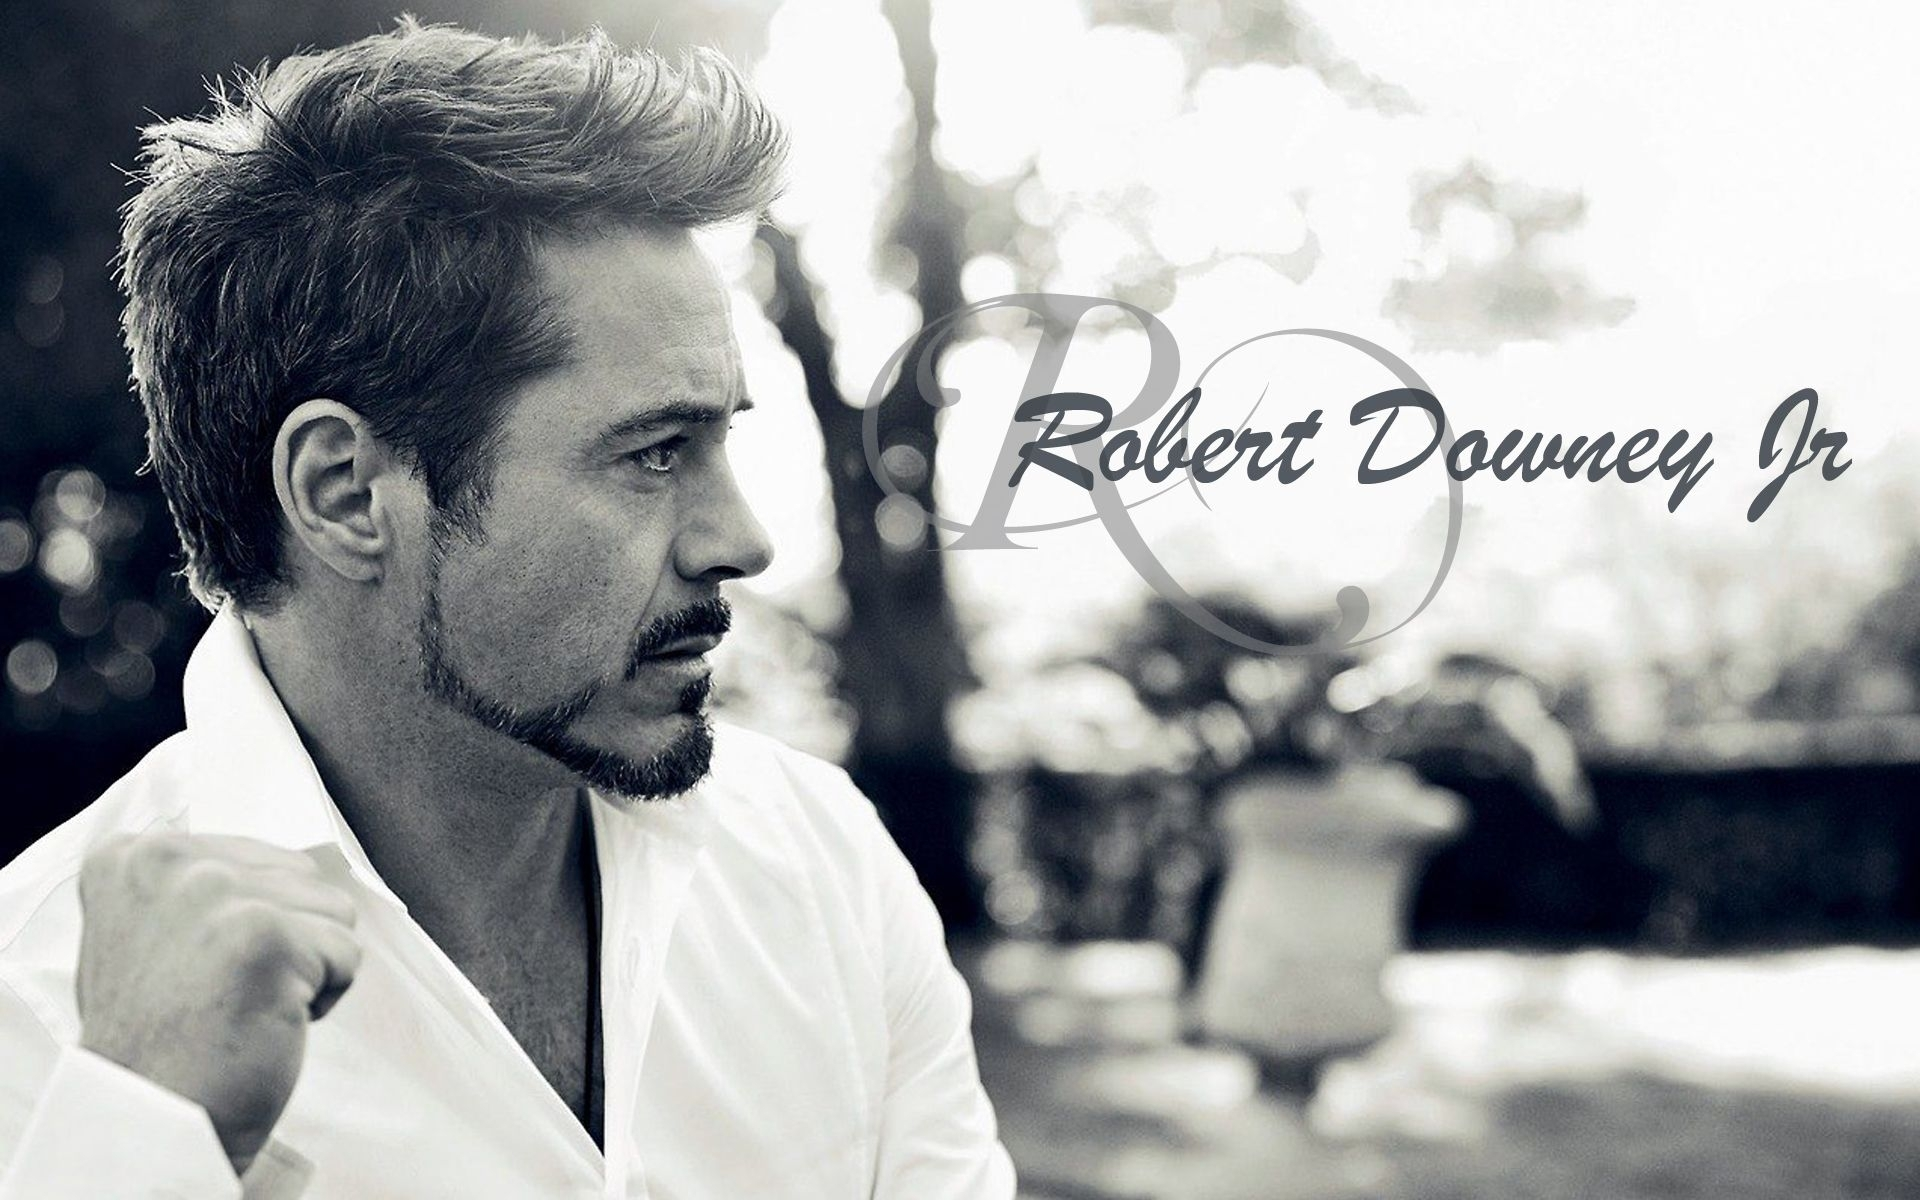 robert downey jr hd images : get free top quality robert downey jr